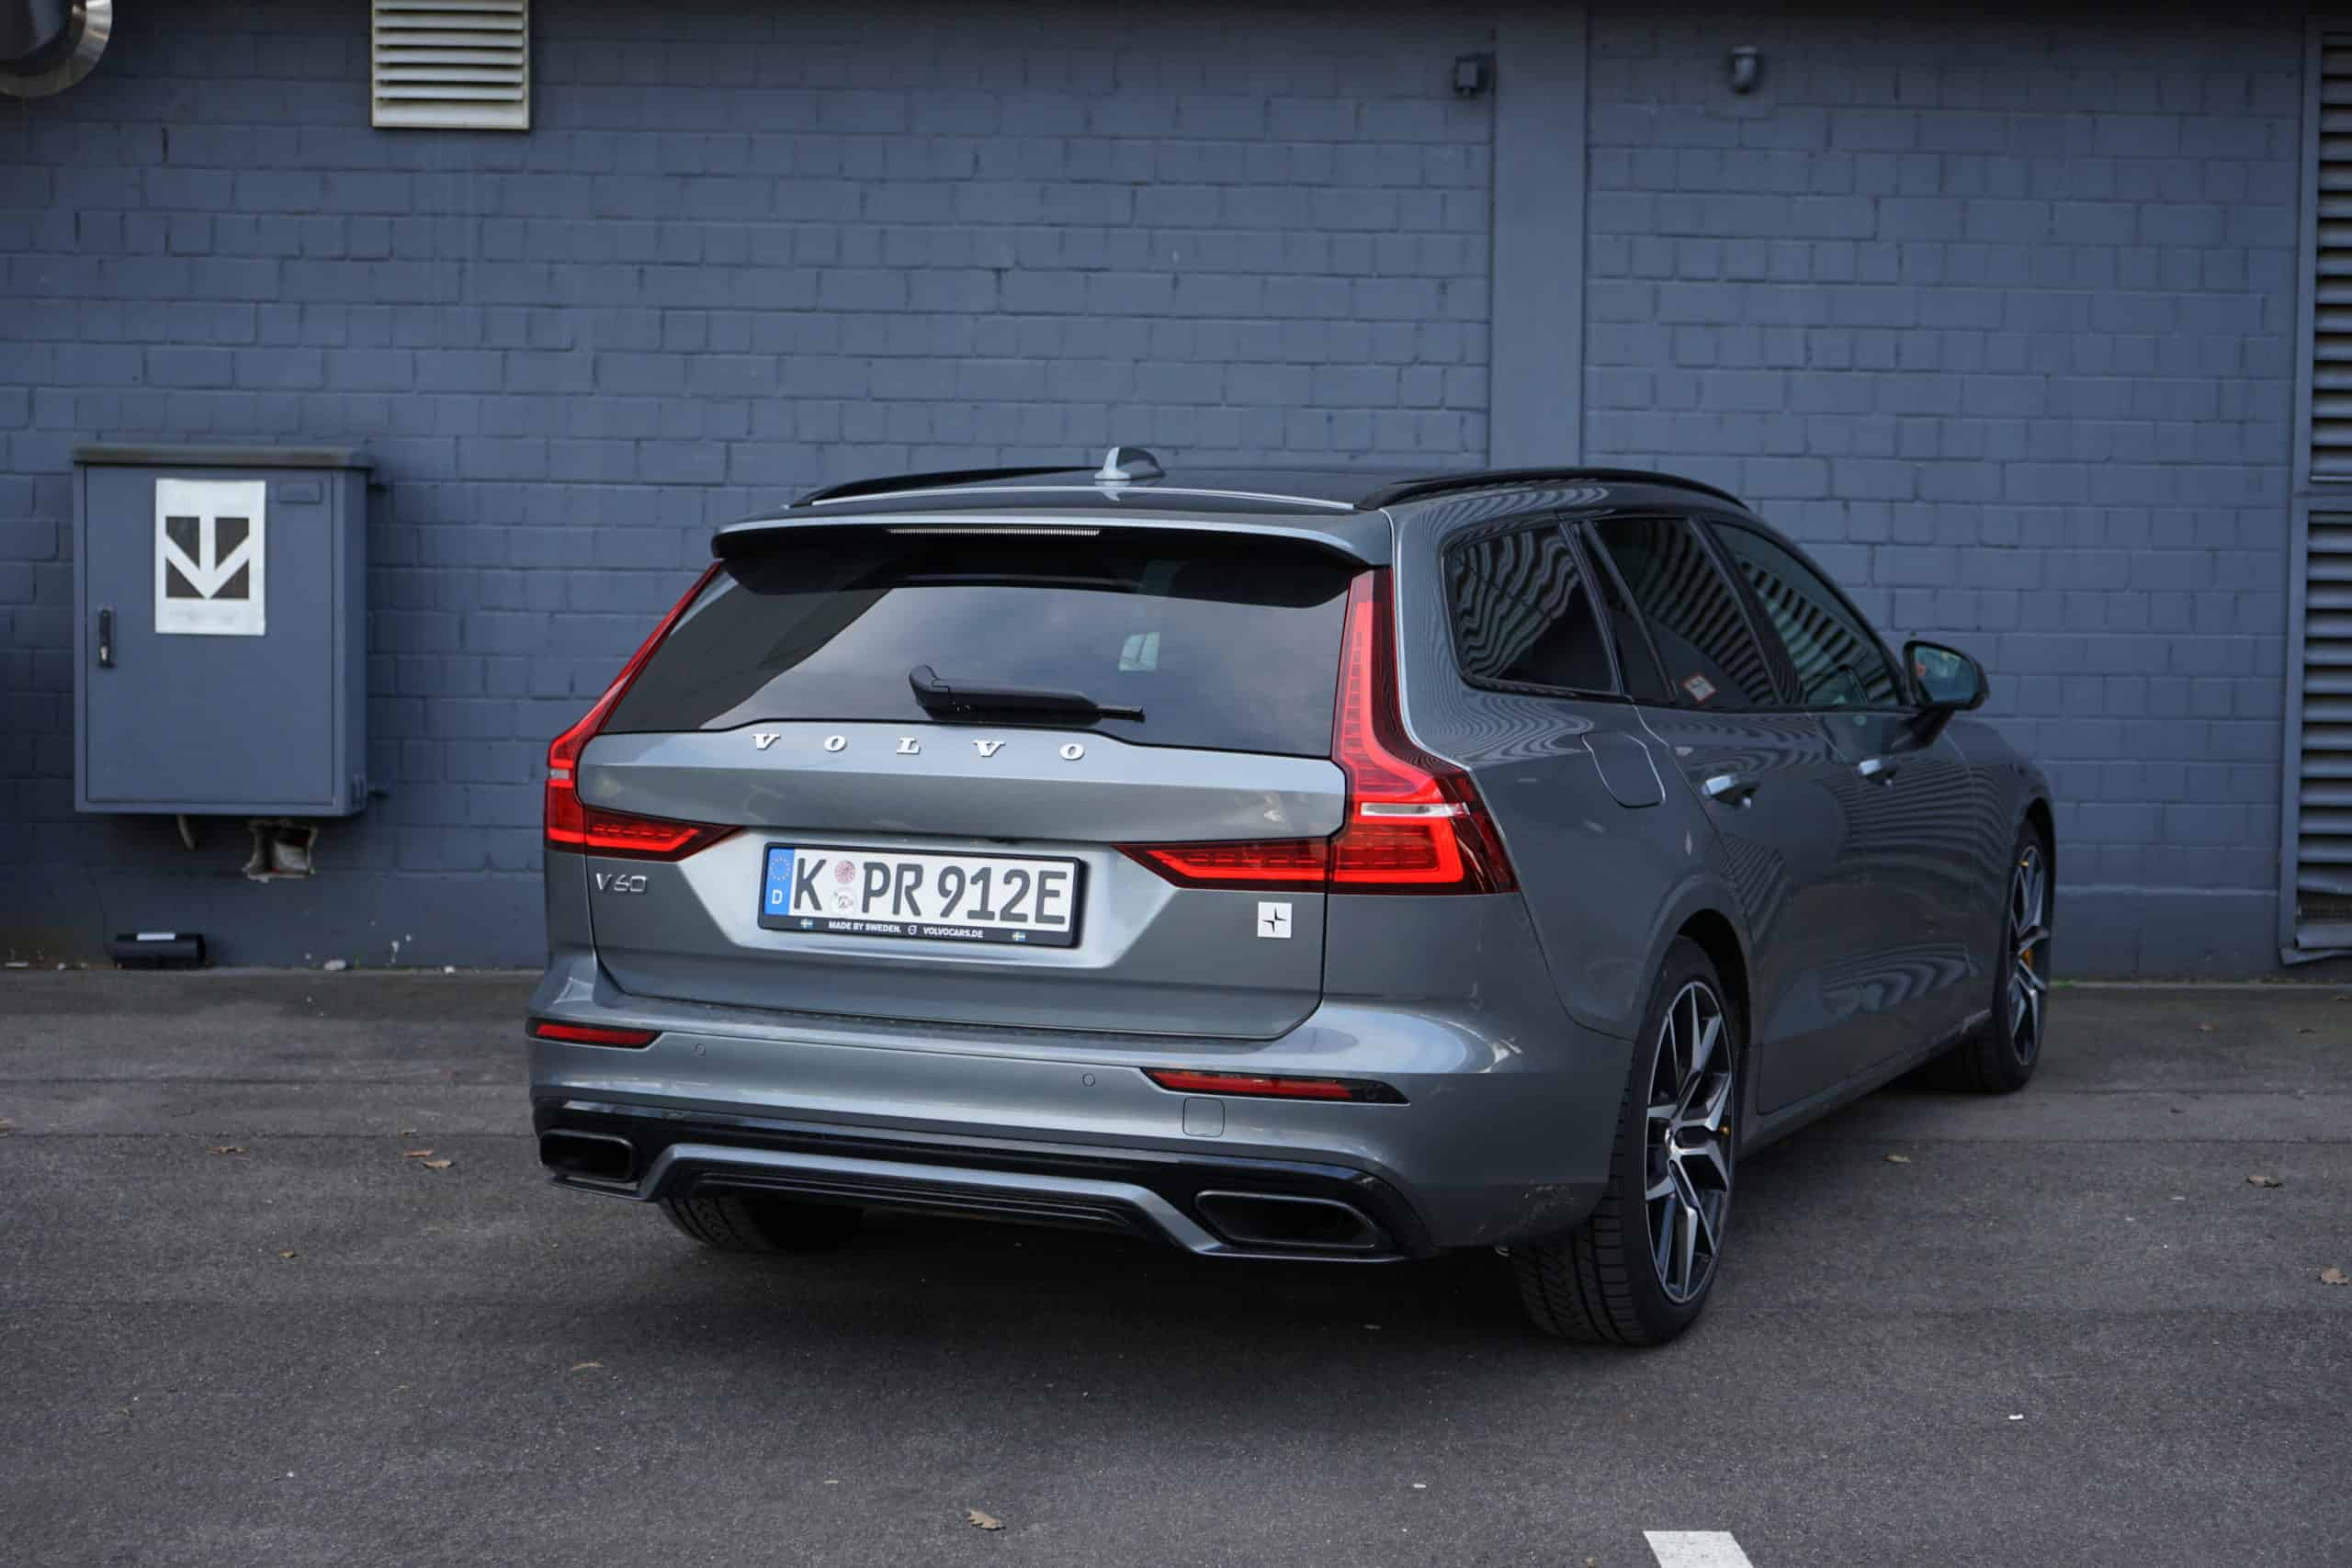 #Volvo #V60 #Polestar Plug-in Hybrid